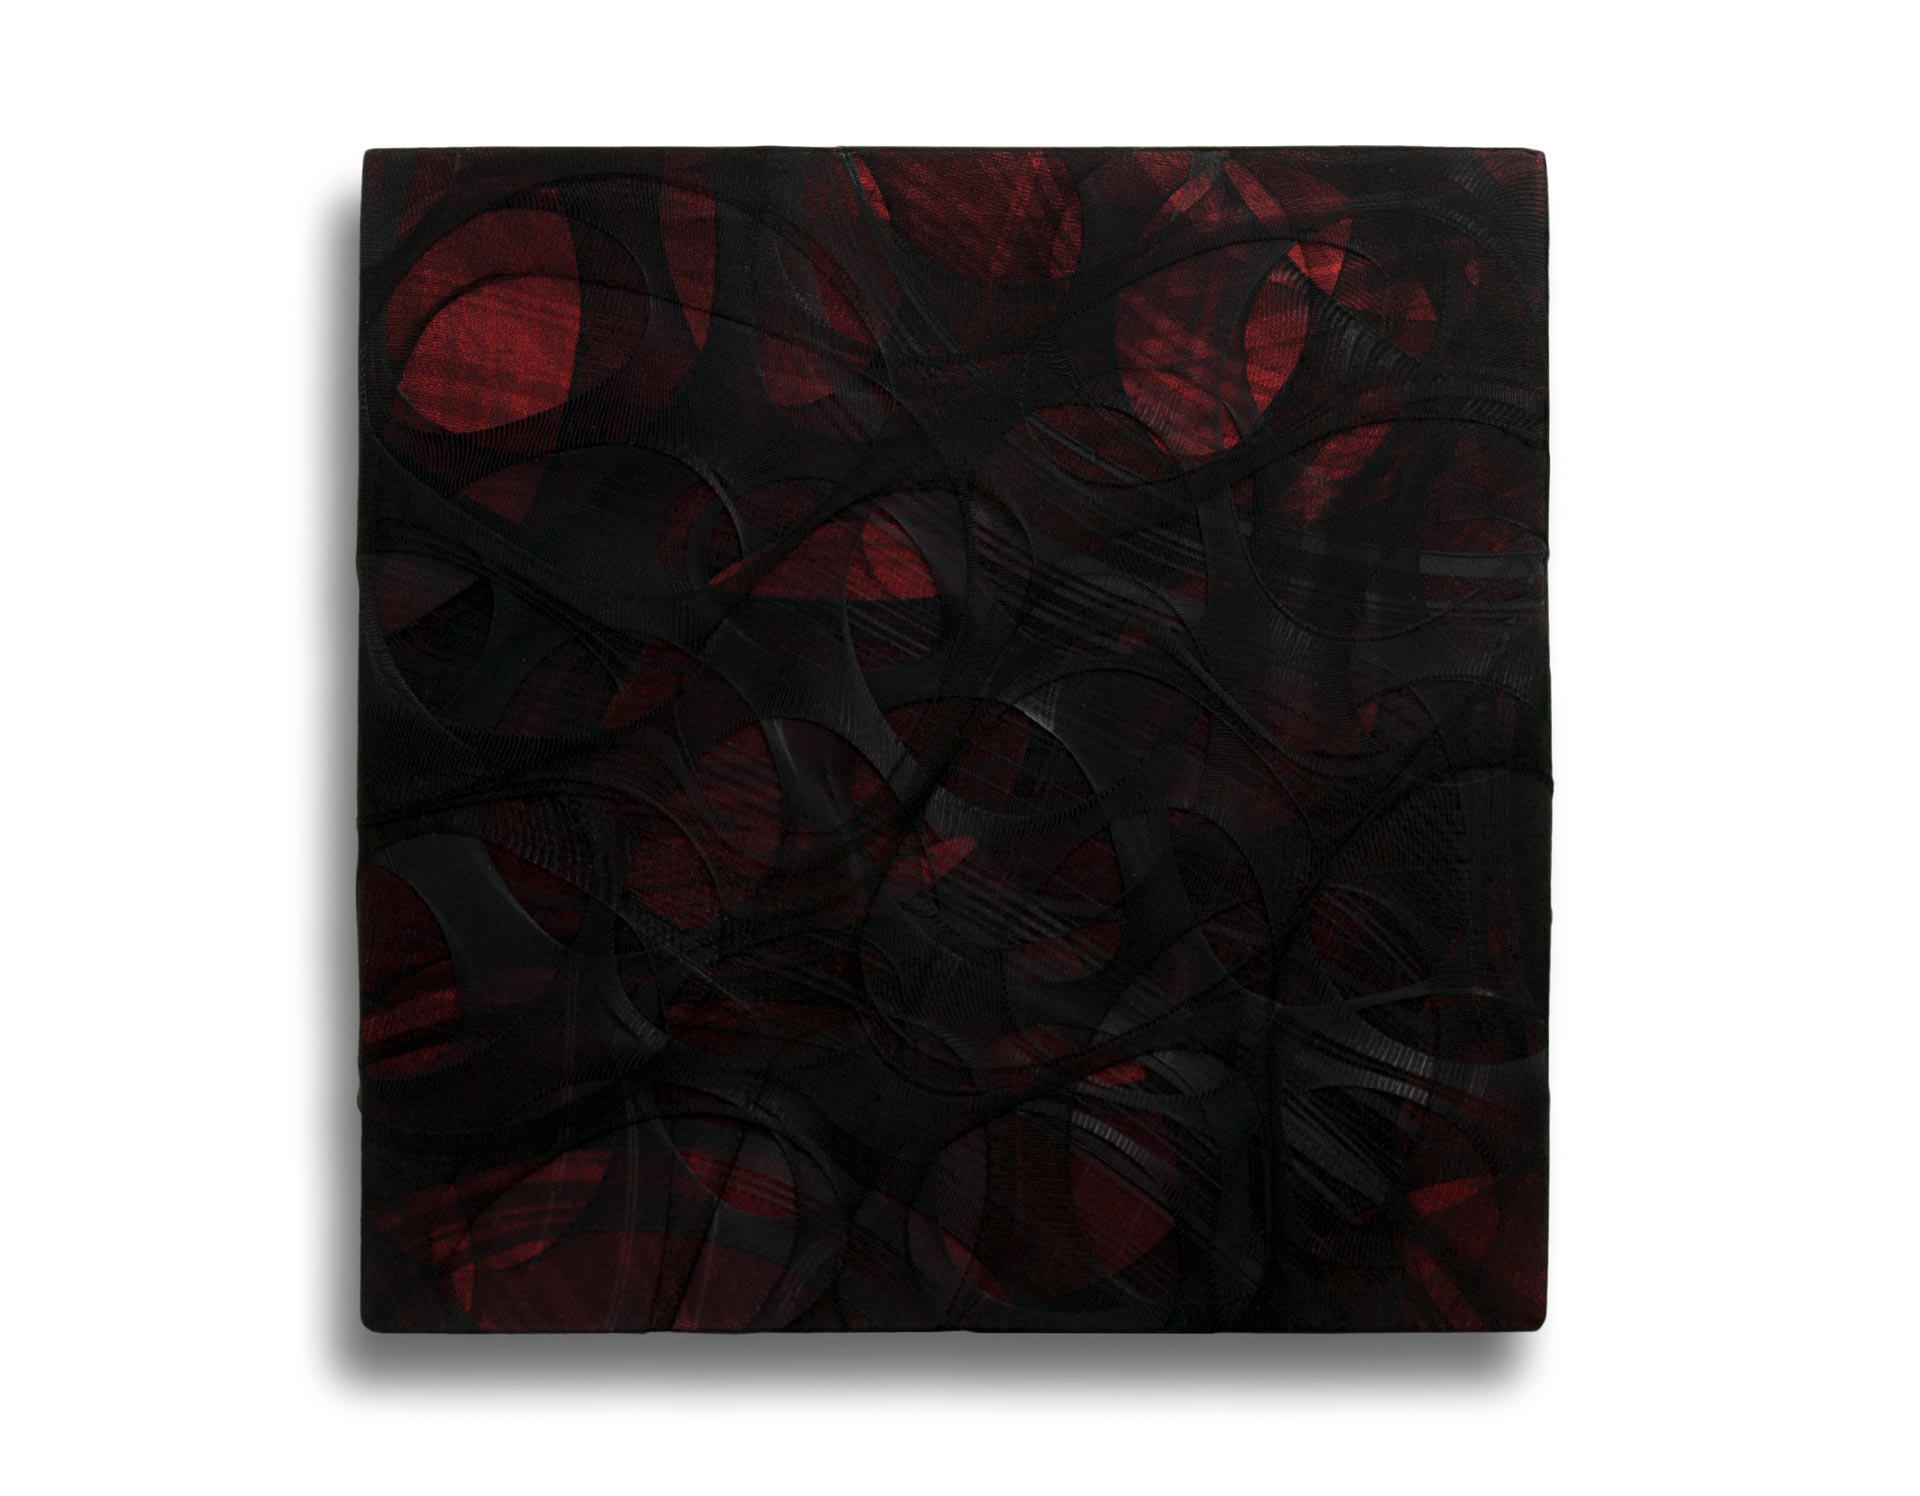 NERI • Komposition 185